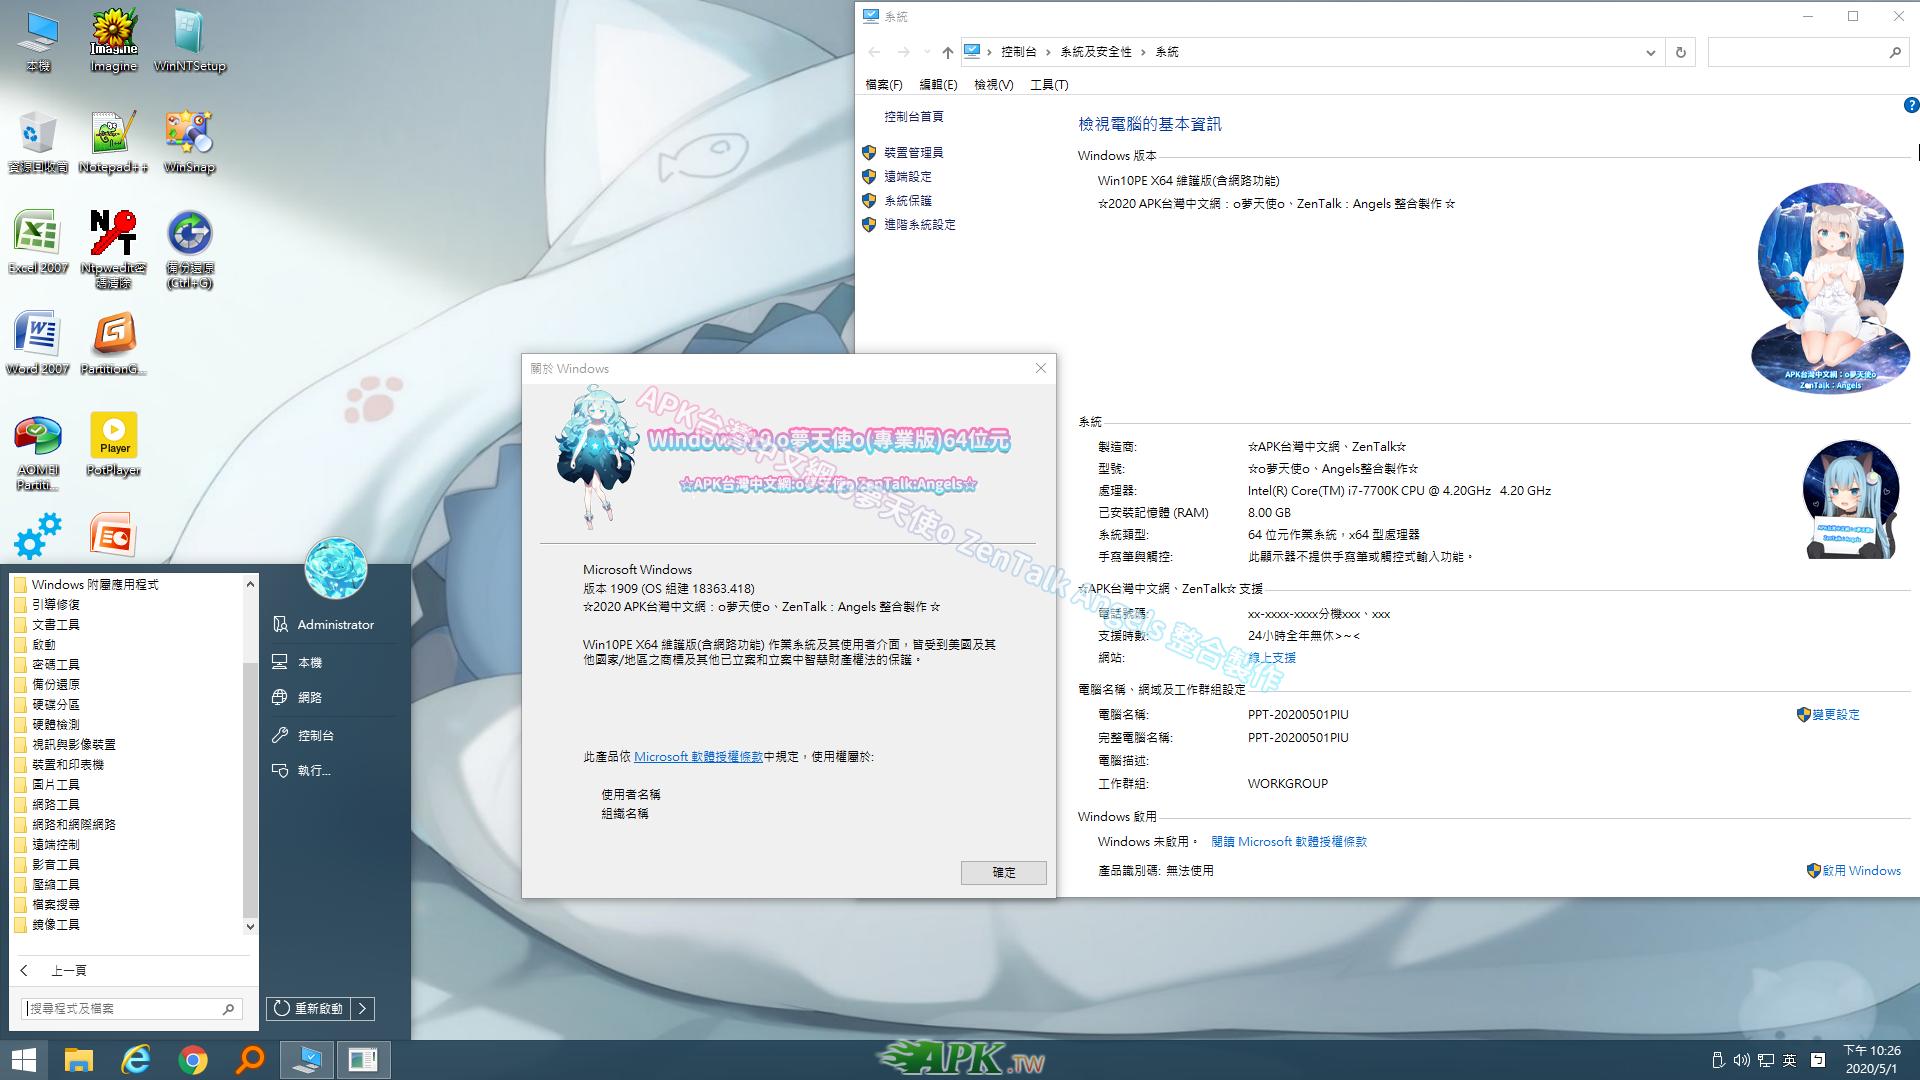 Windows 10 x64 (2)-2020-05-01-22-27-00.png